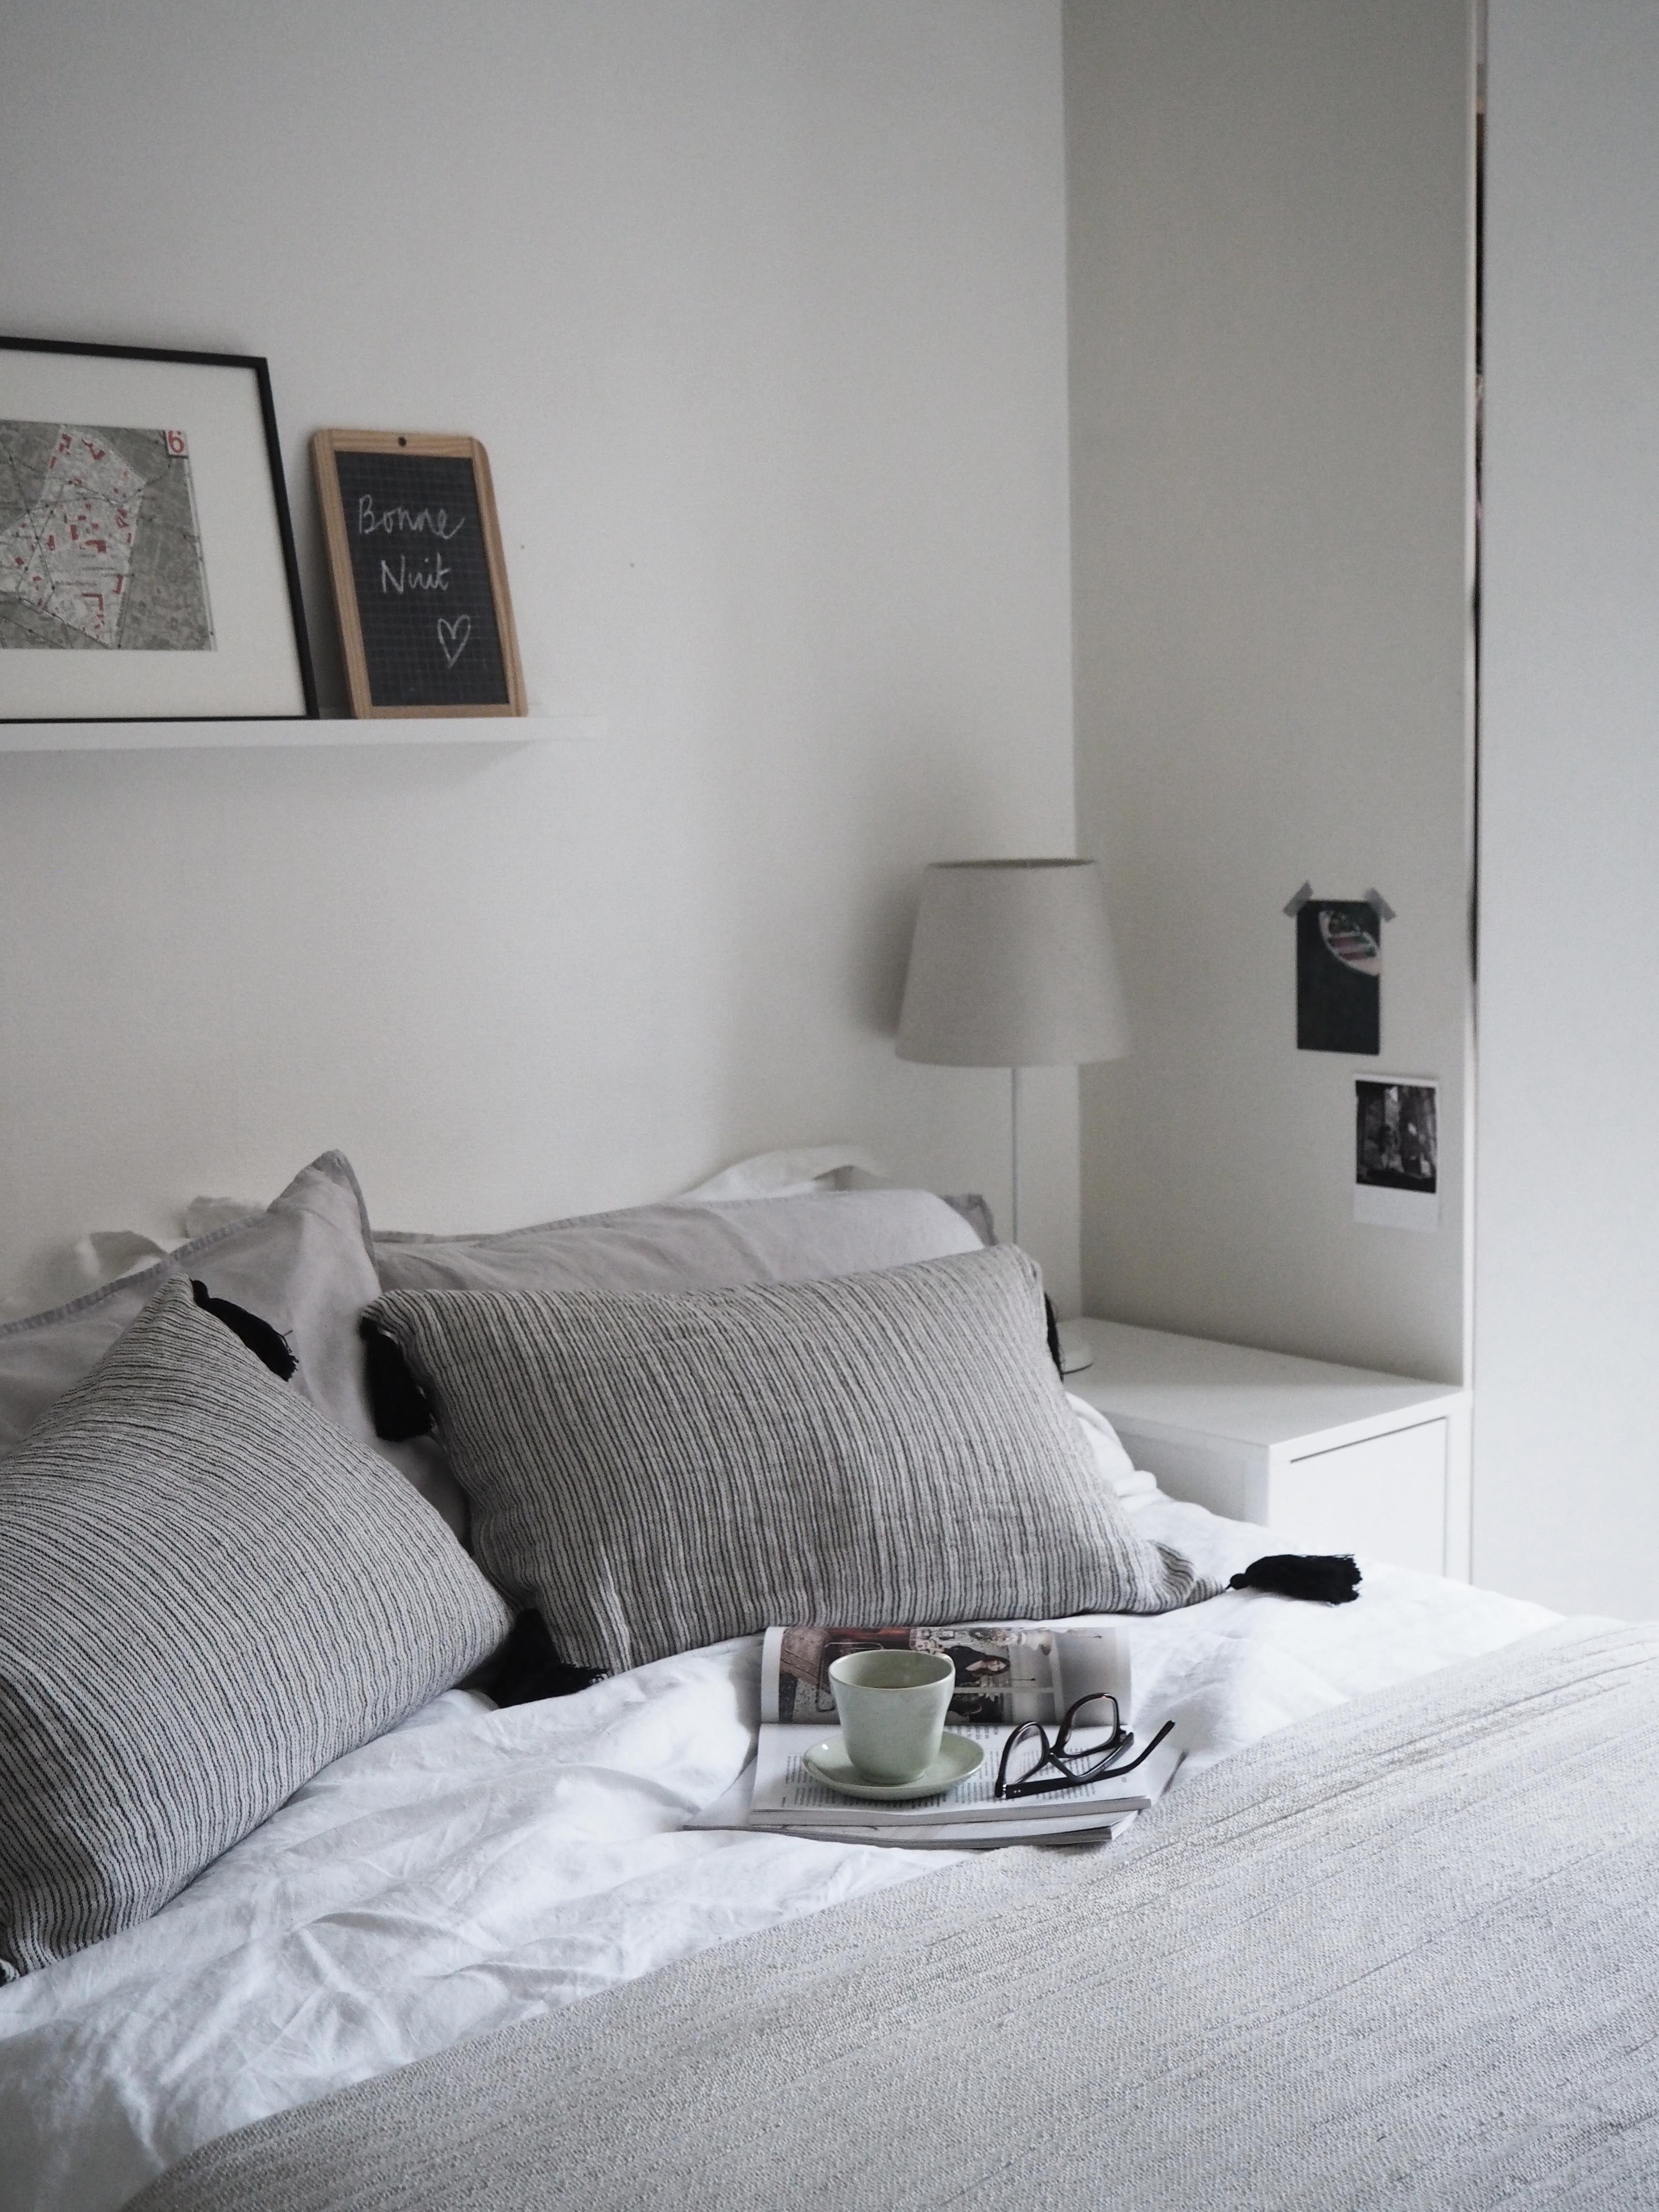 better sleep with a leesa mattress cosy room bedroom on better quality sleep with better bedroom decorations id=50133